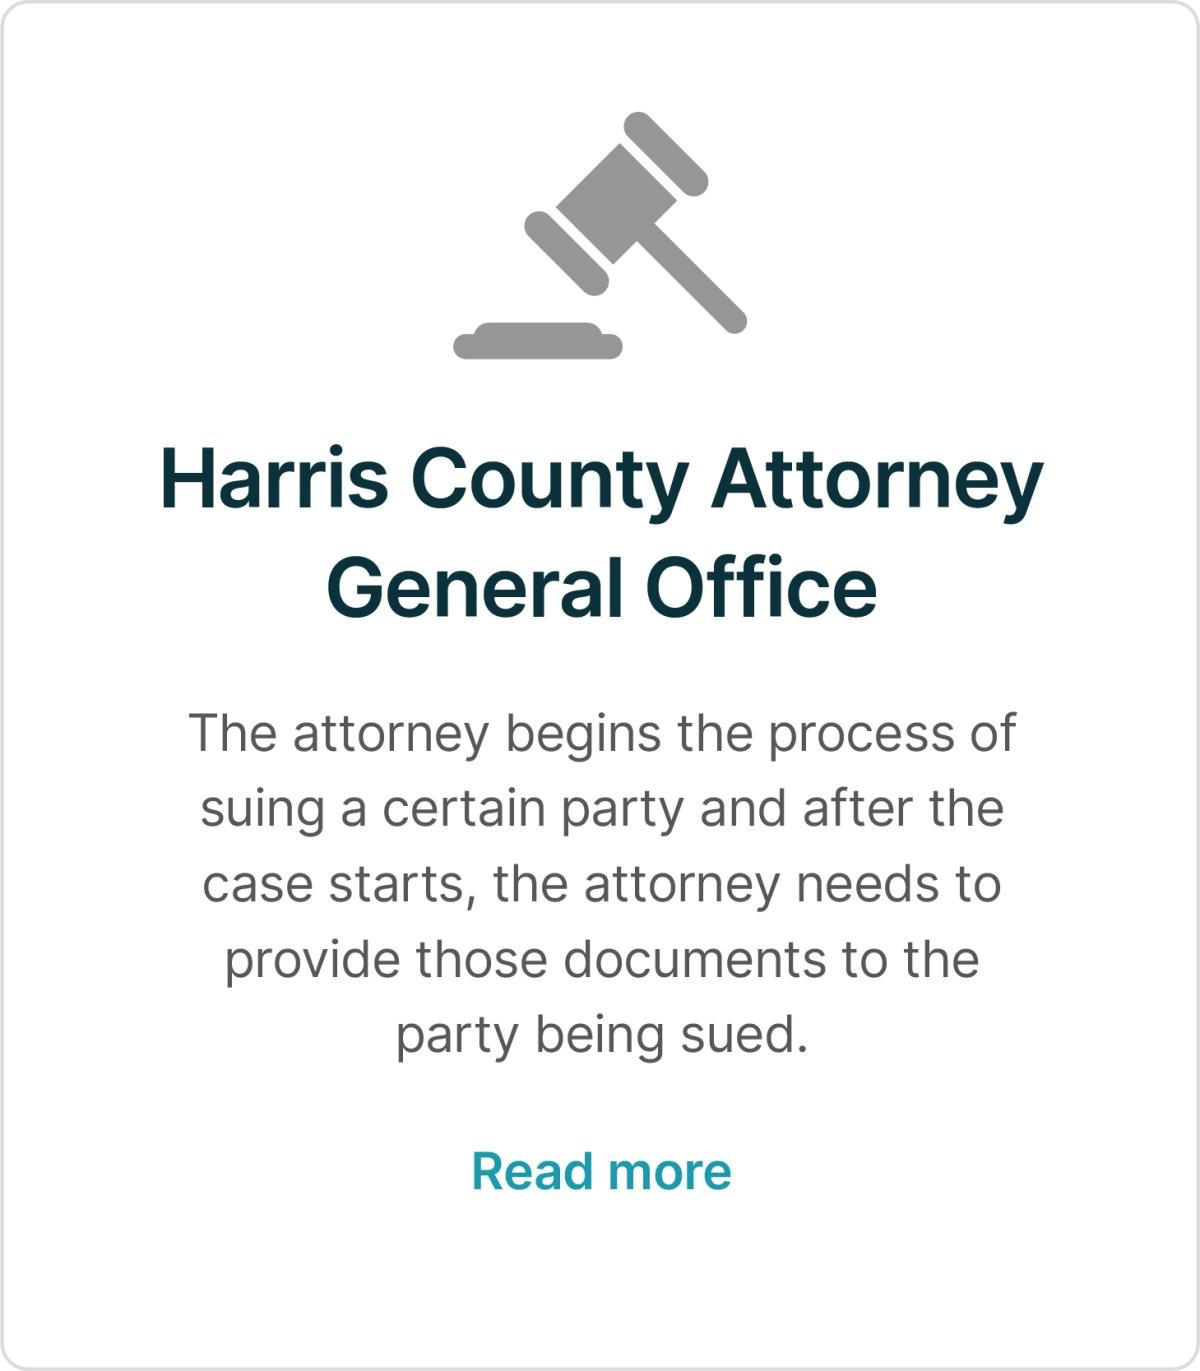 Harris-County-Attorney